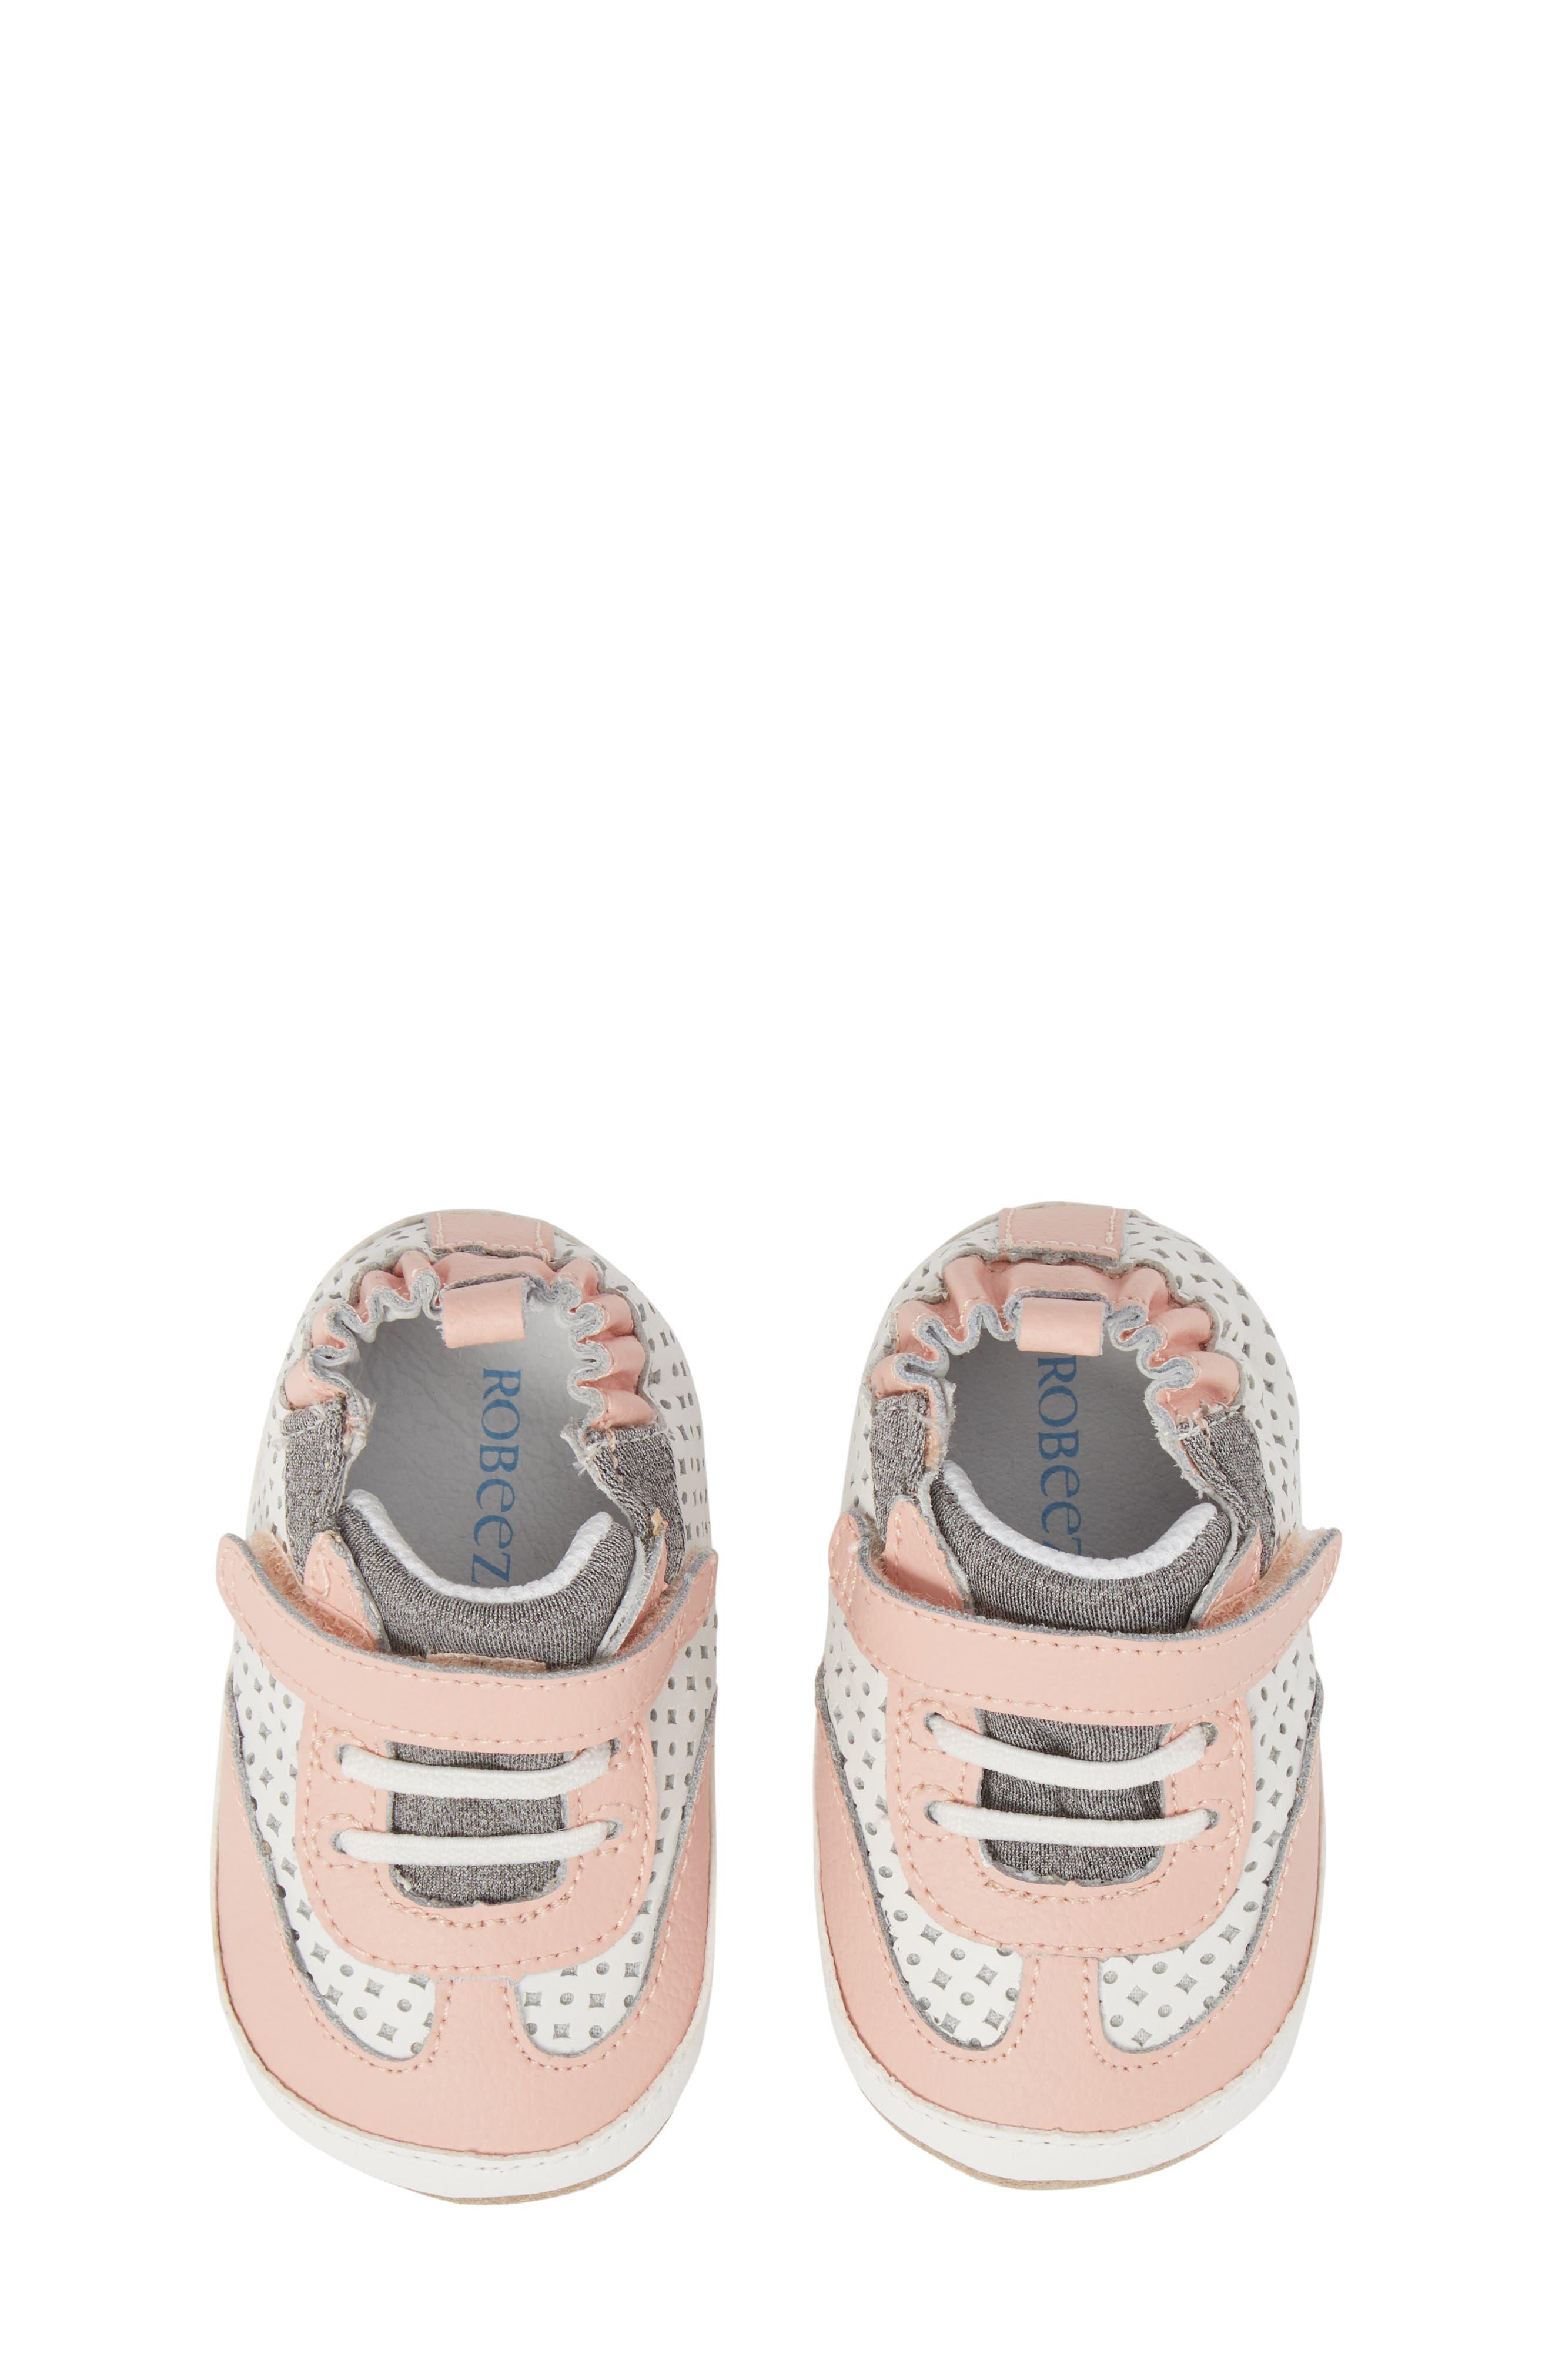 Mini Shoez Katie's Kicks Sneaker,                         Main,                         color, Pink